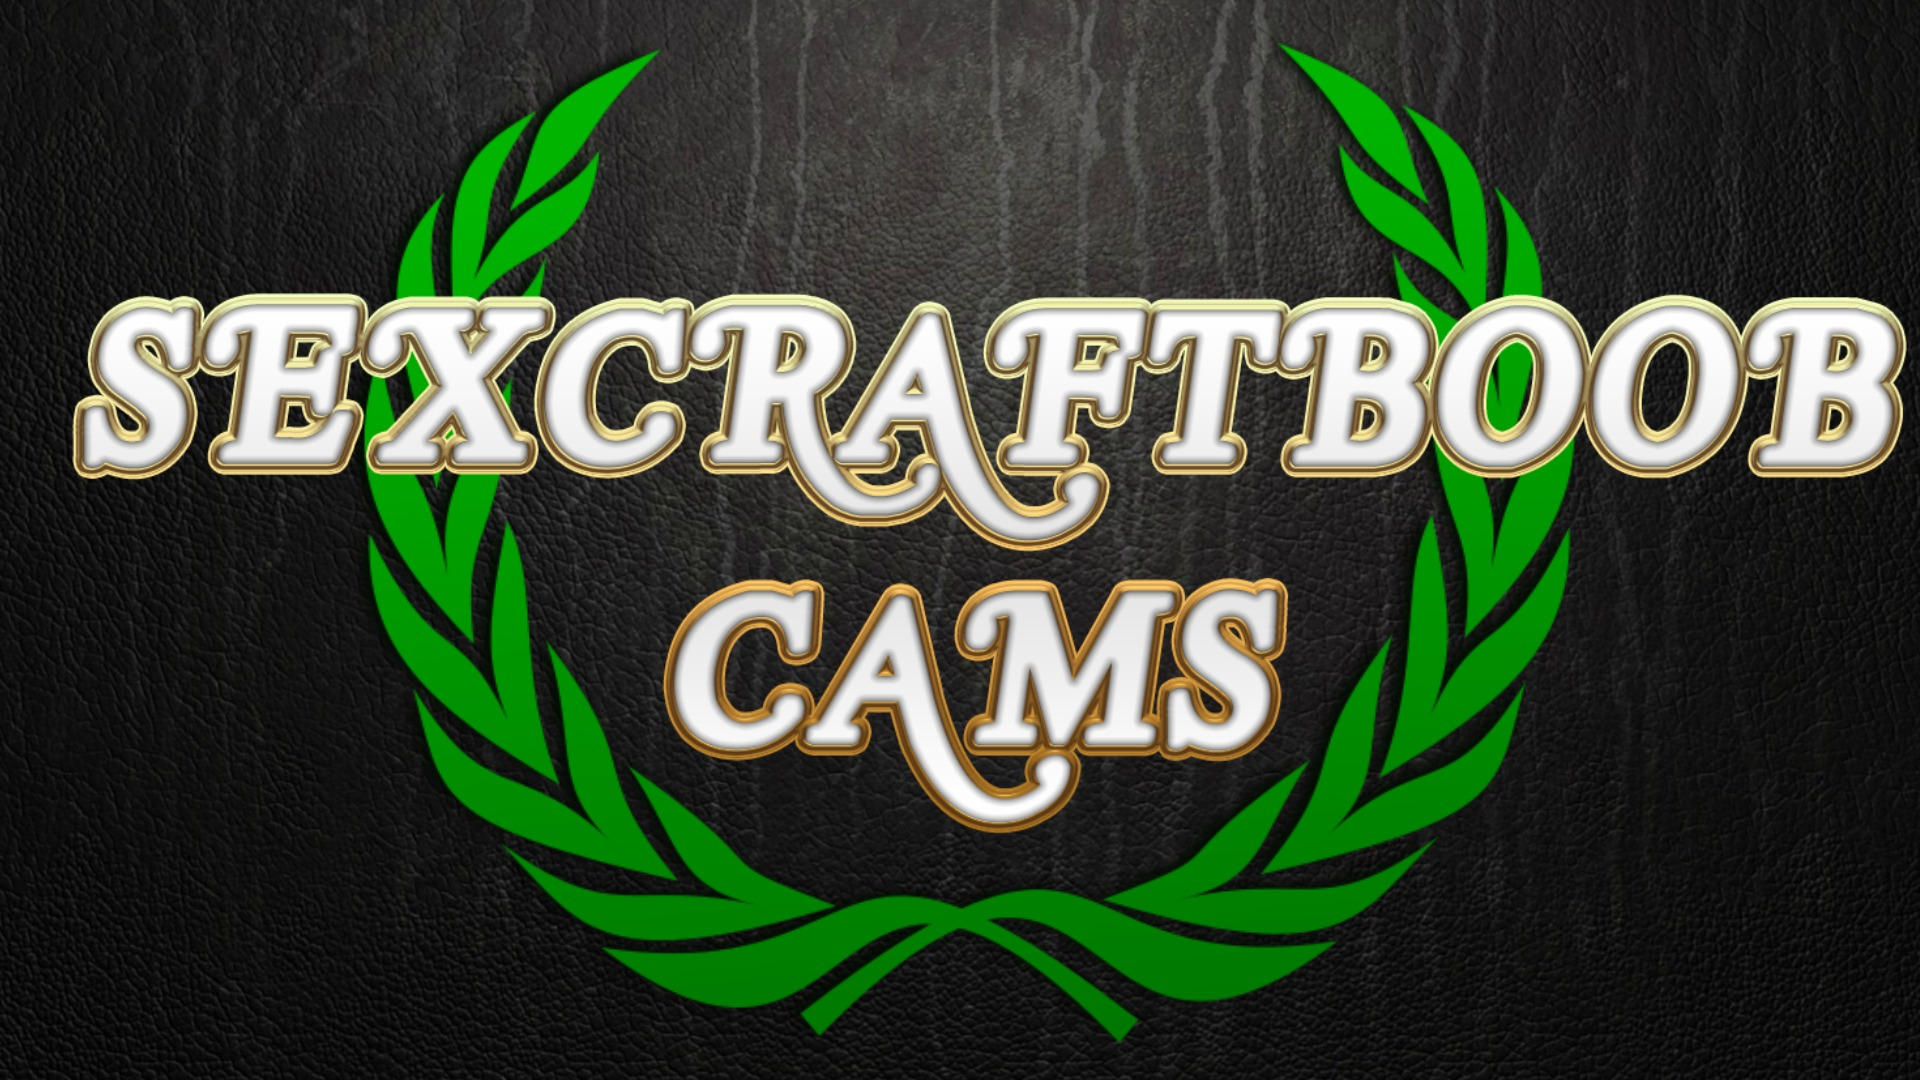 Sexcraftboob-Cams